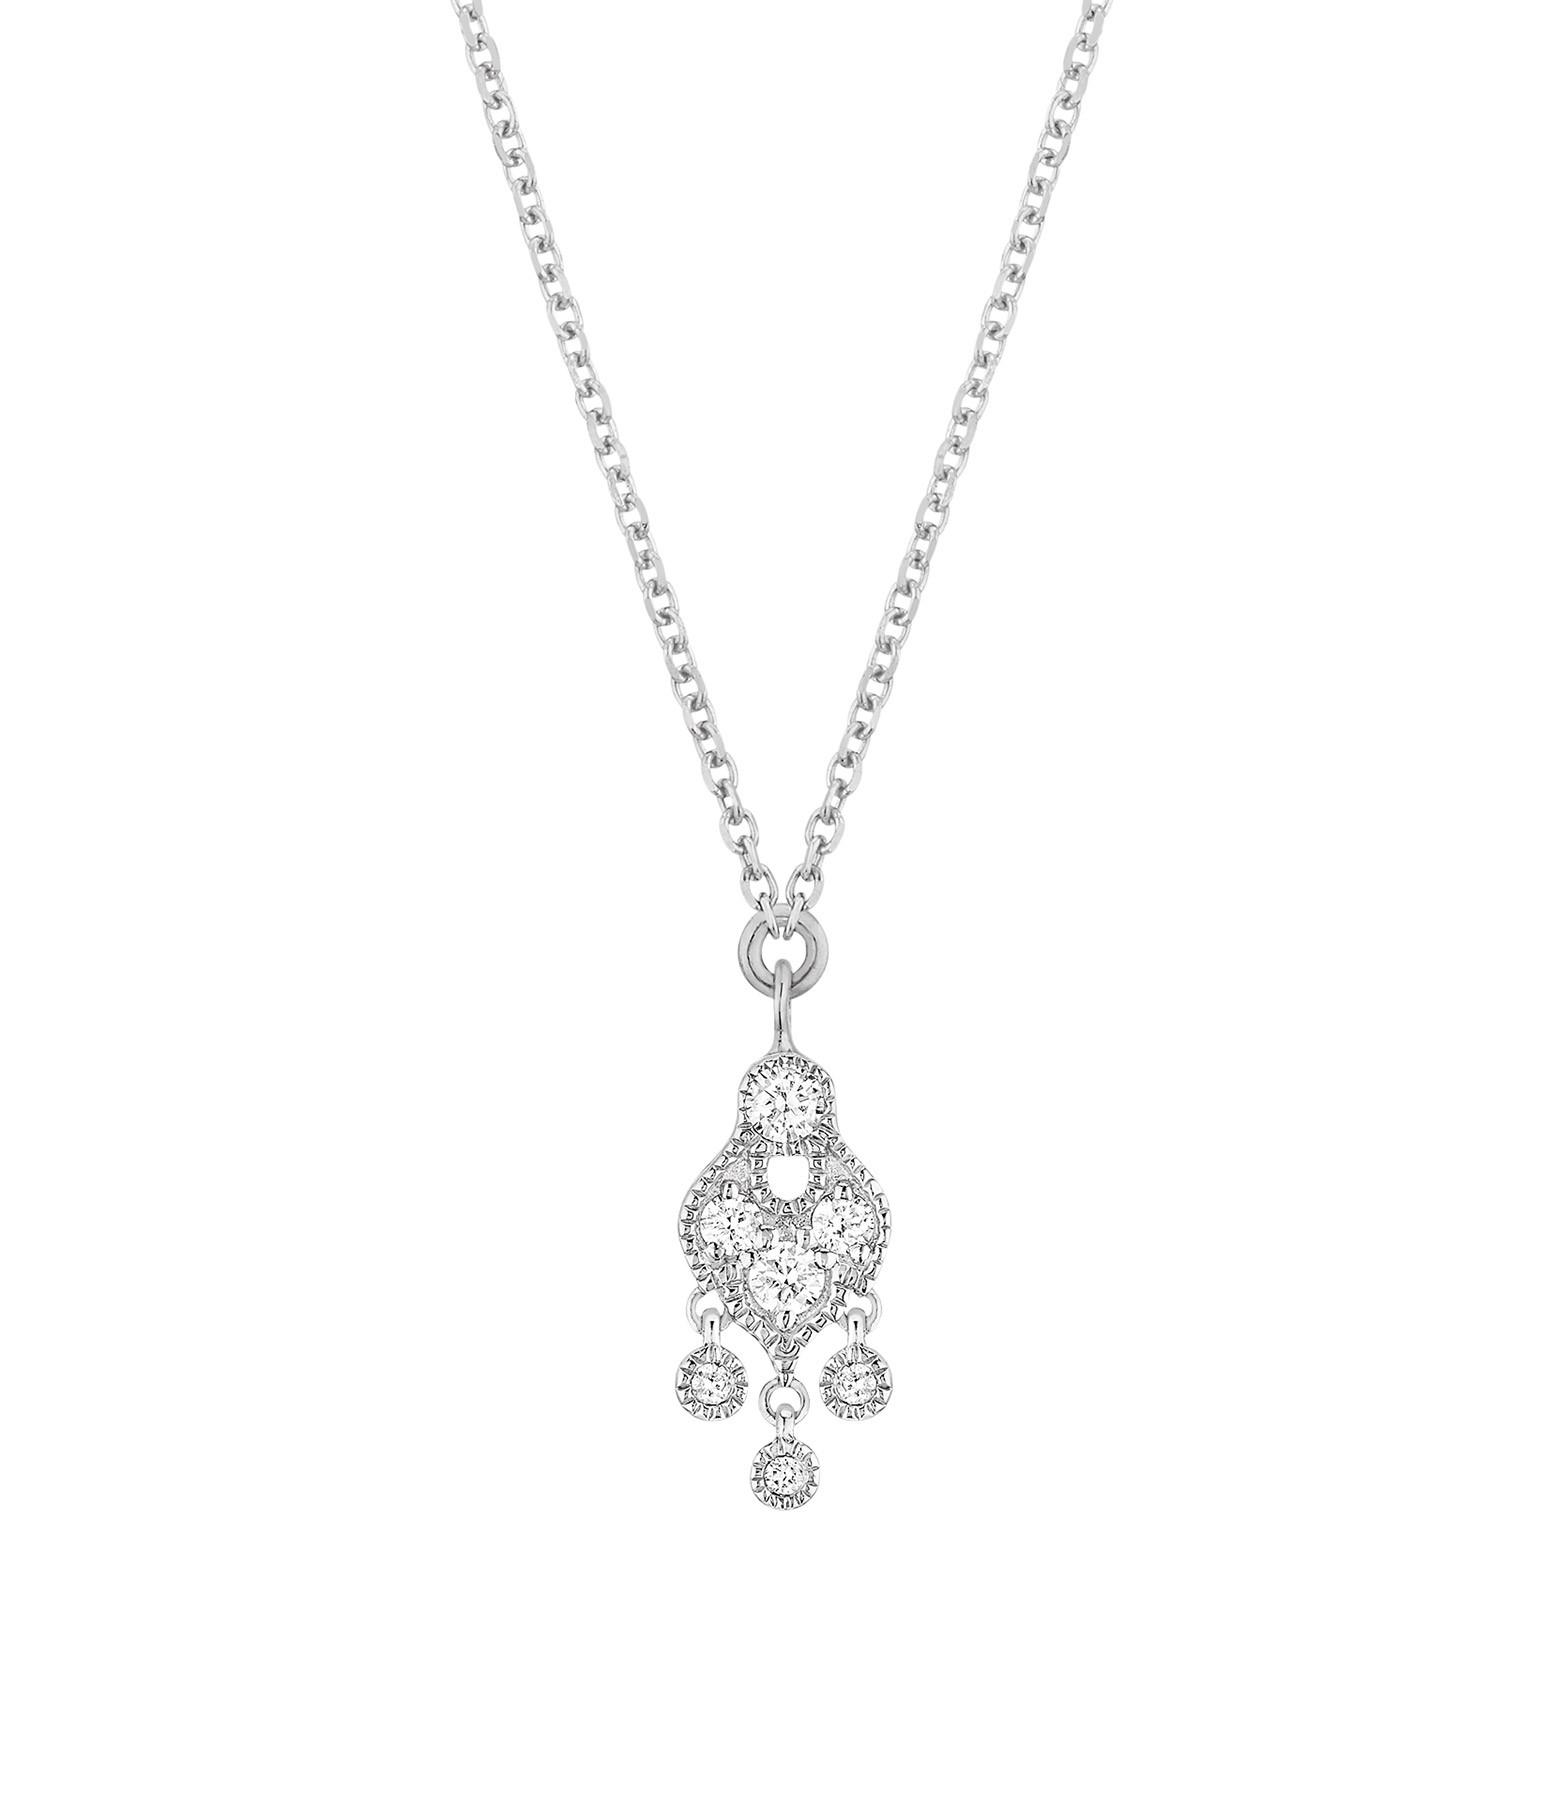 STONE PARIS - Collier Sultane Or Diamants